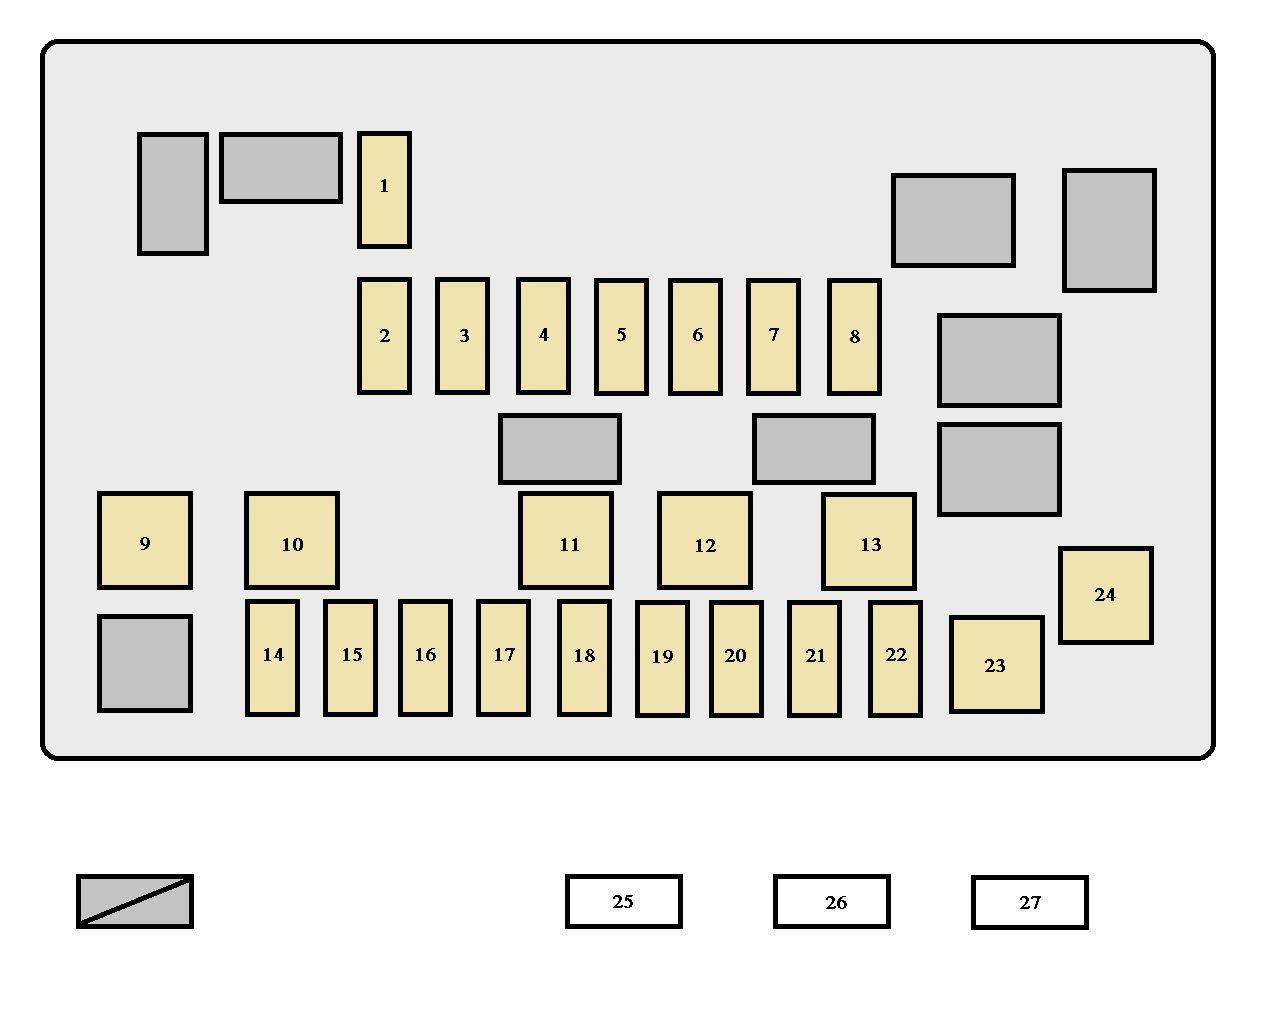 Tc Fuse Diagram Detailed Wiring Diagrams 2007 Vw Gli Scion Honda Fuses